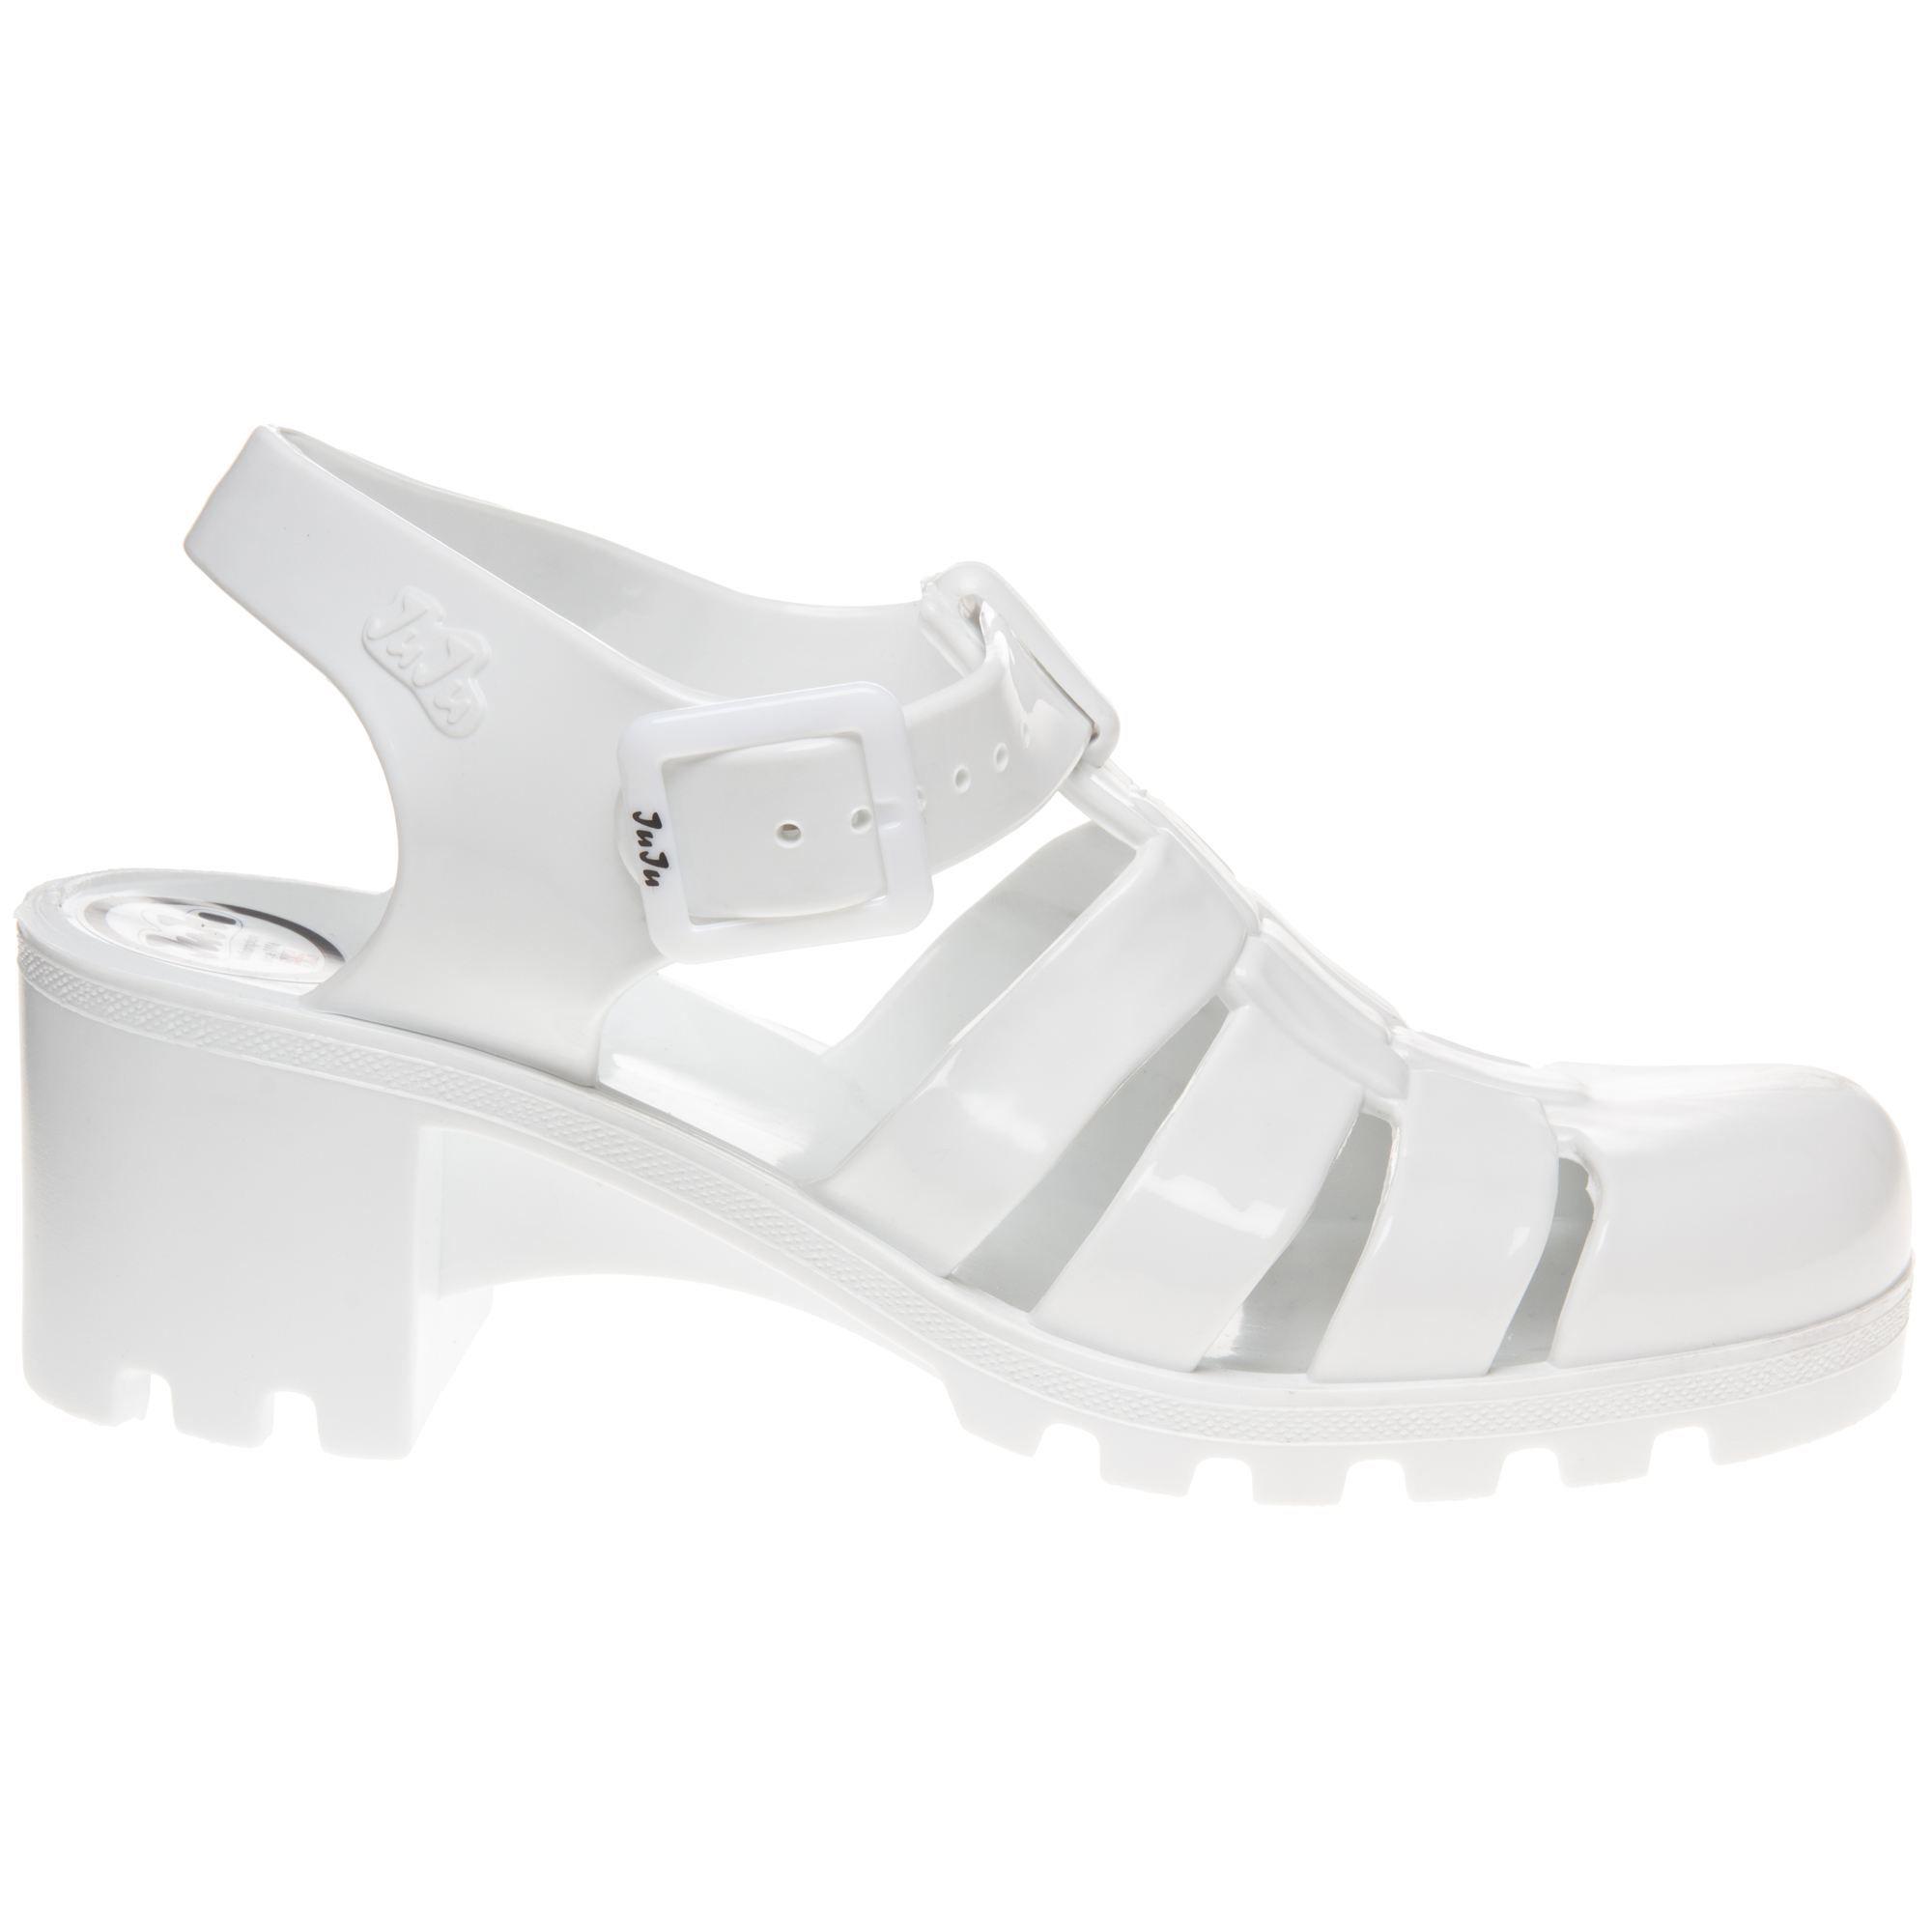 686fd33dc26 Juju Jellies Babe Sandals in white plastic £24.99 Women - SOLETRADER ...